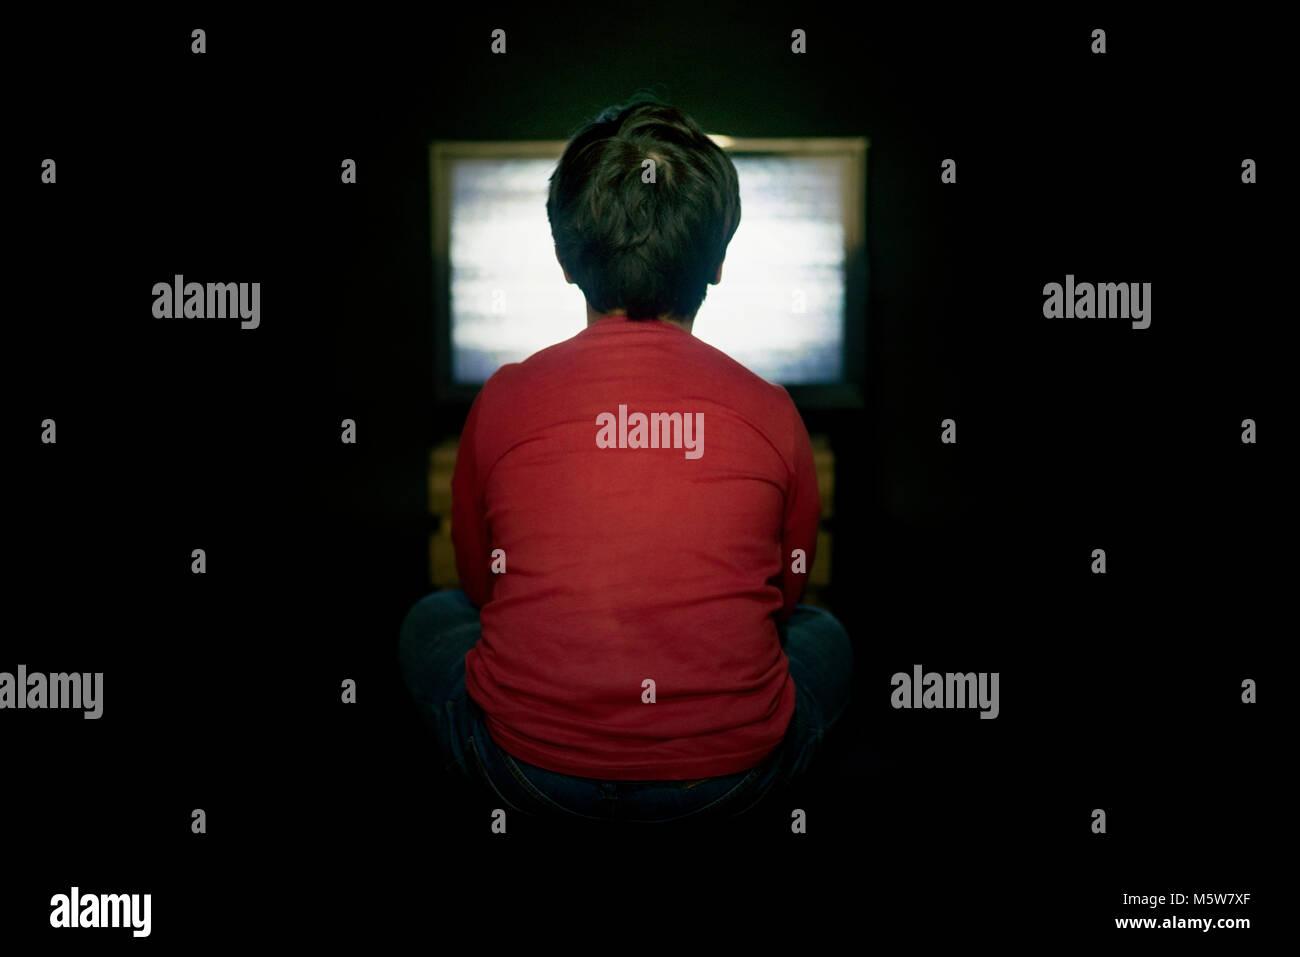 boy watching TV on black background - Stock Image